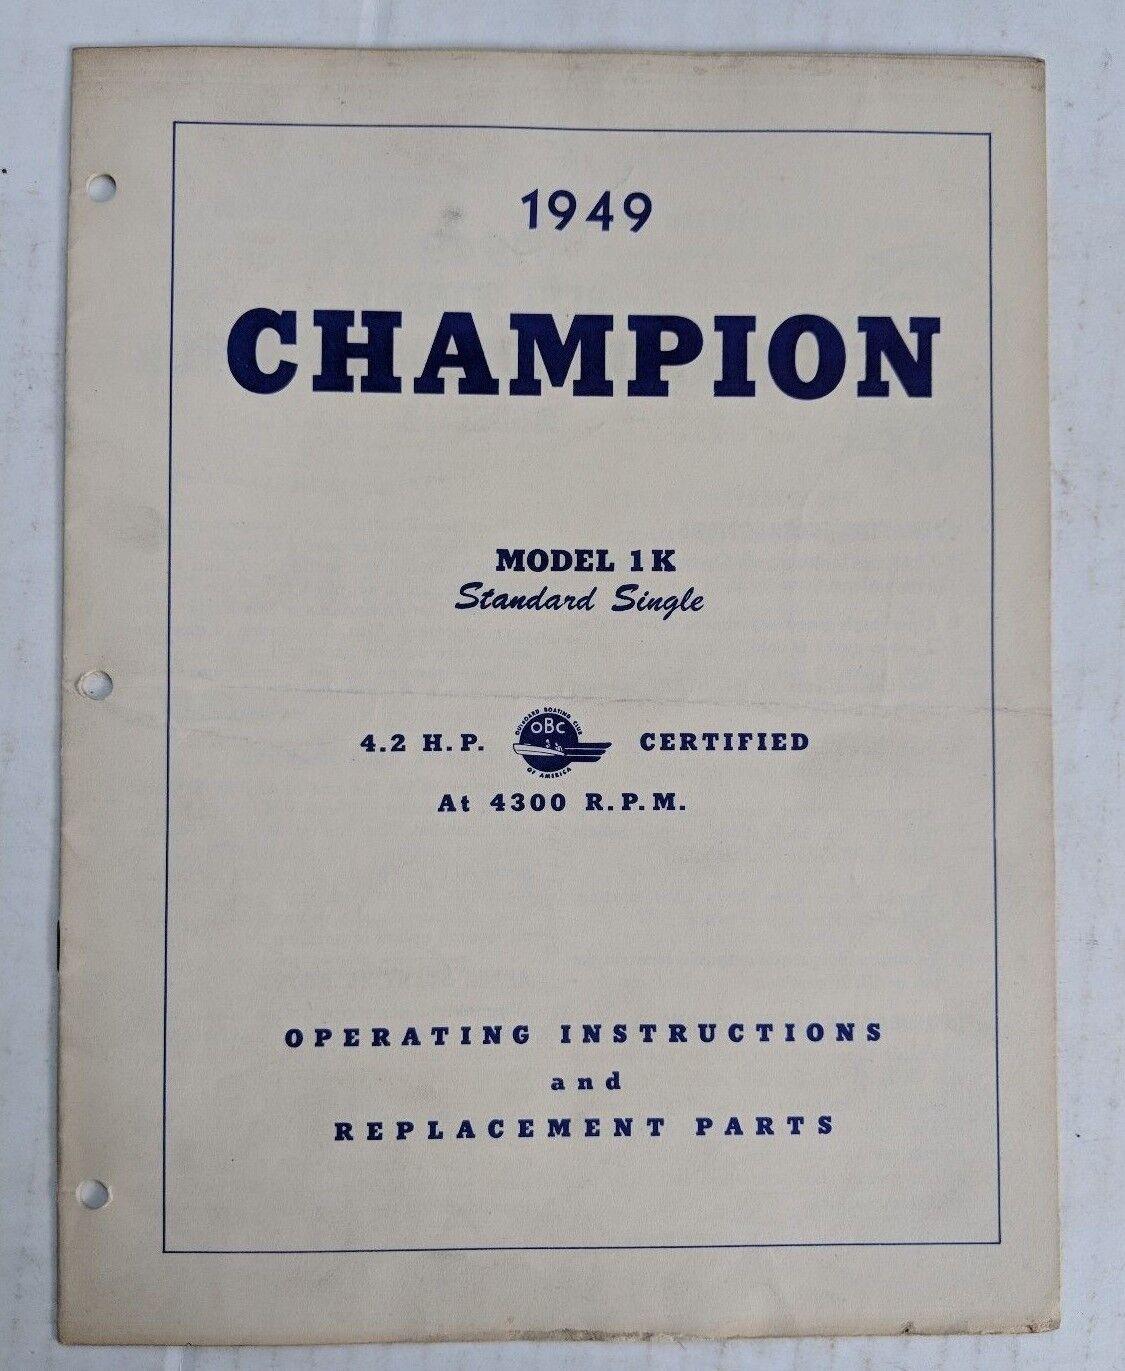 1949 CHAMPION 4.2 HP MODEL 1K OPERATING INSTRUCTIONS & PARTS MANUAL